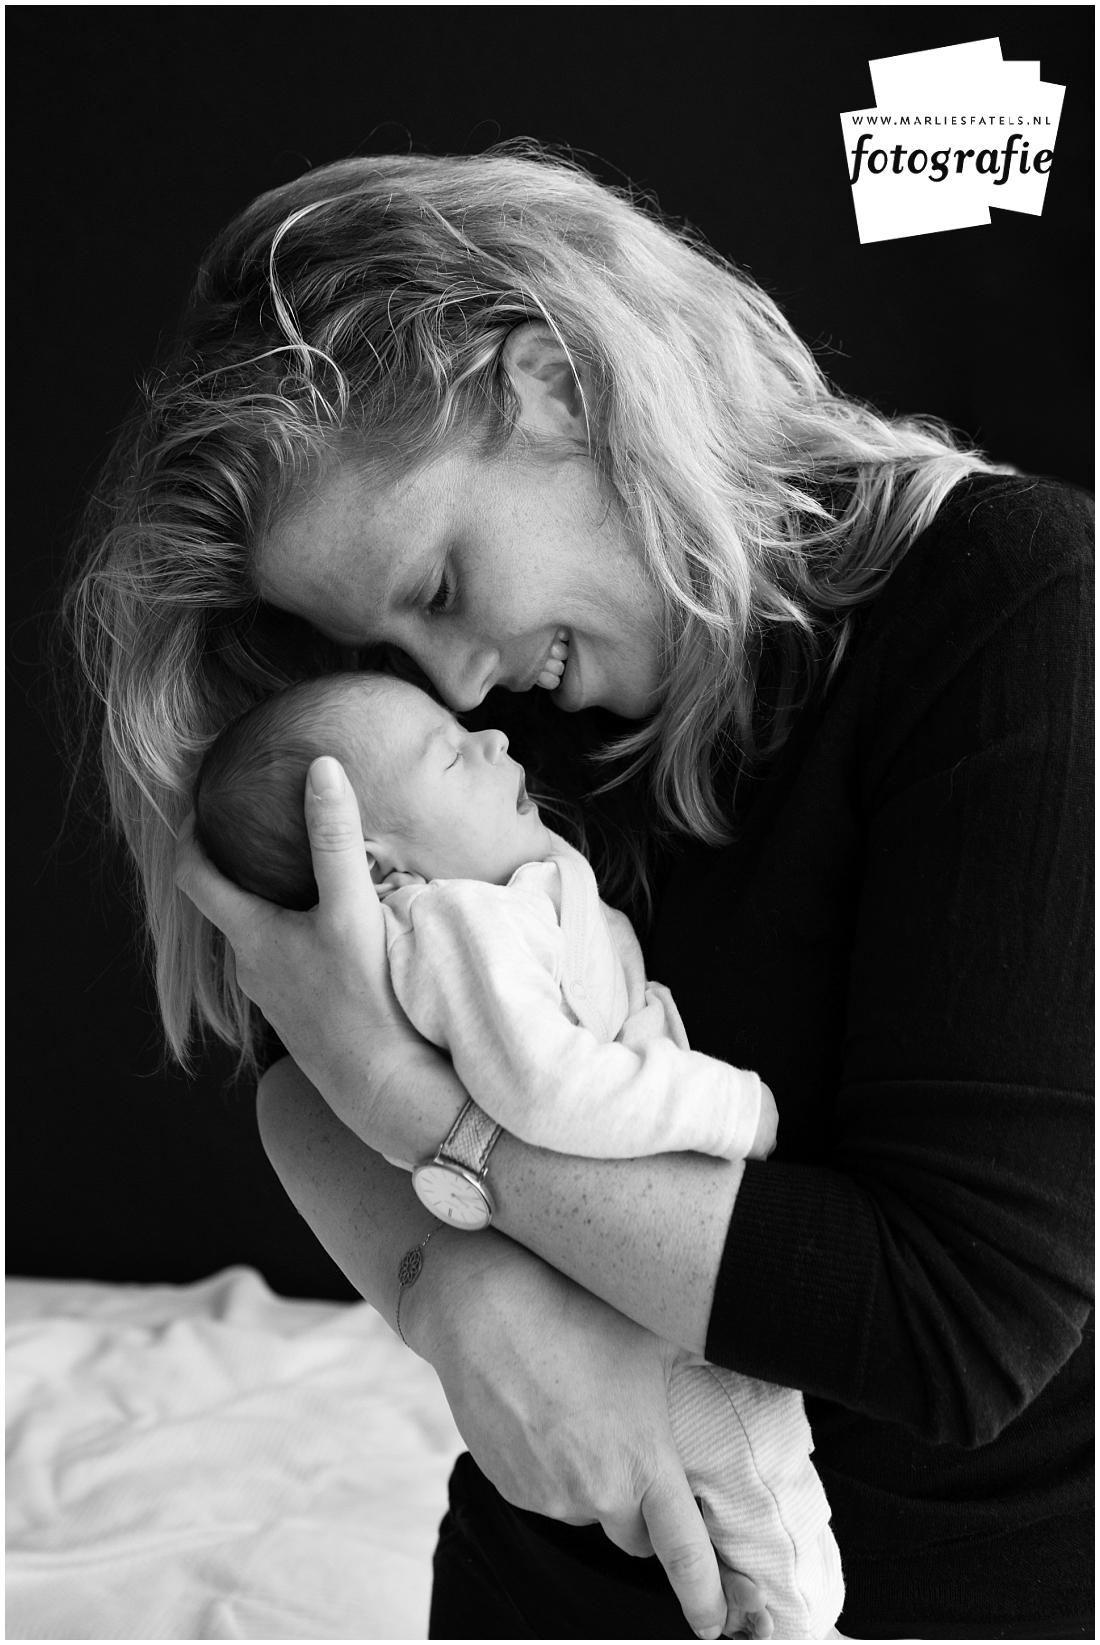 Newborn-fotografie-baby-fotograaf-Castricum-Fatels-5